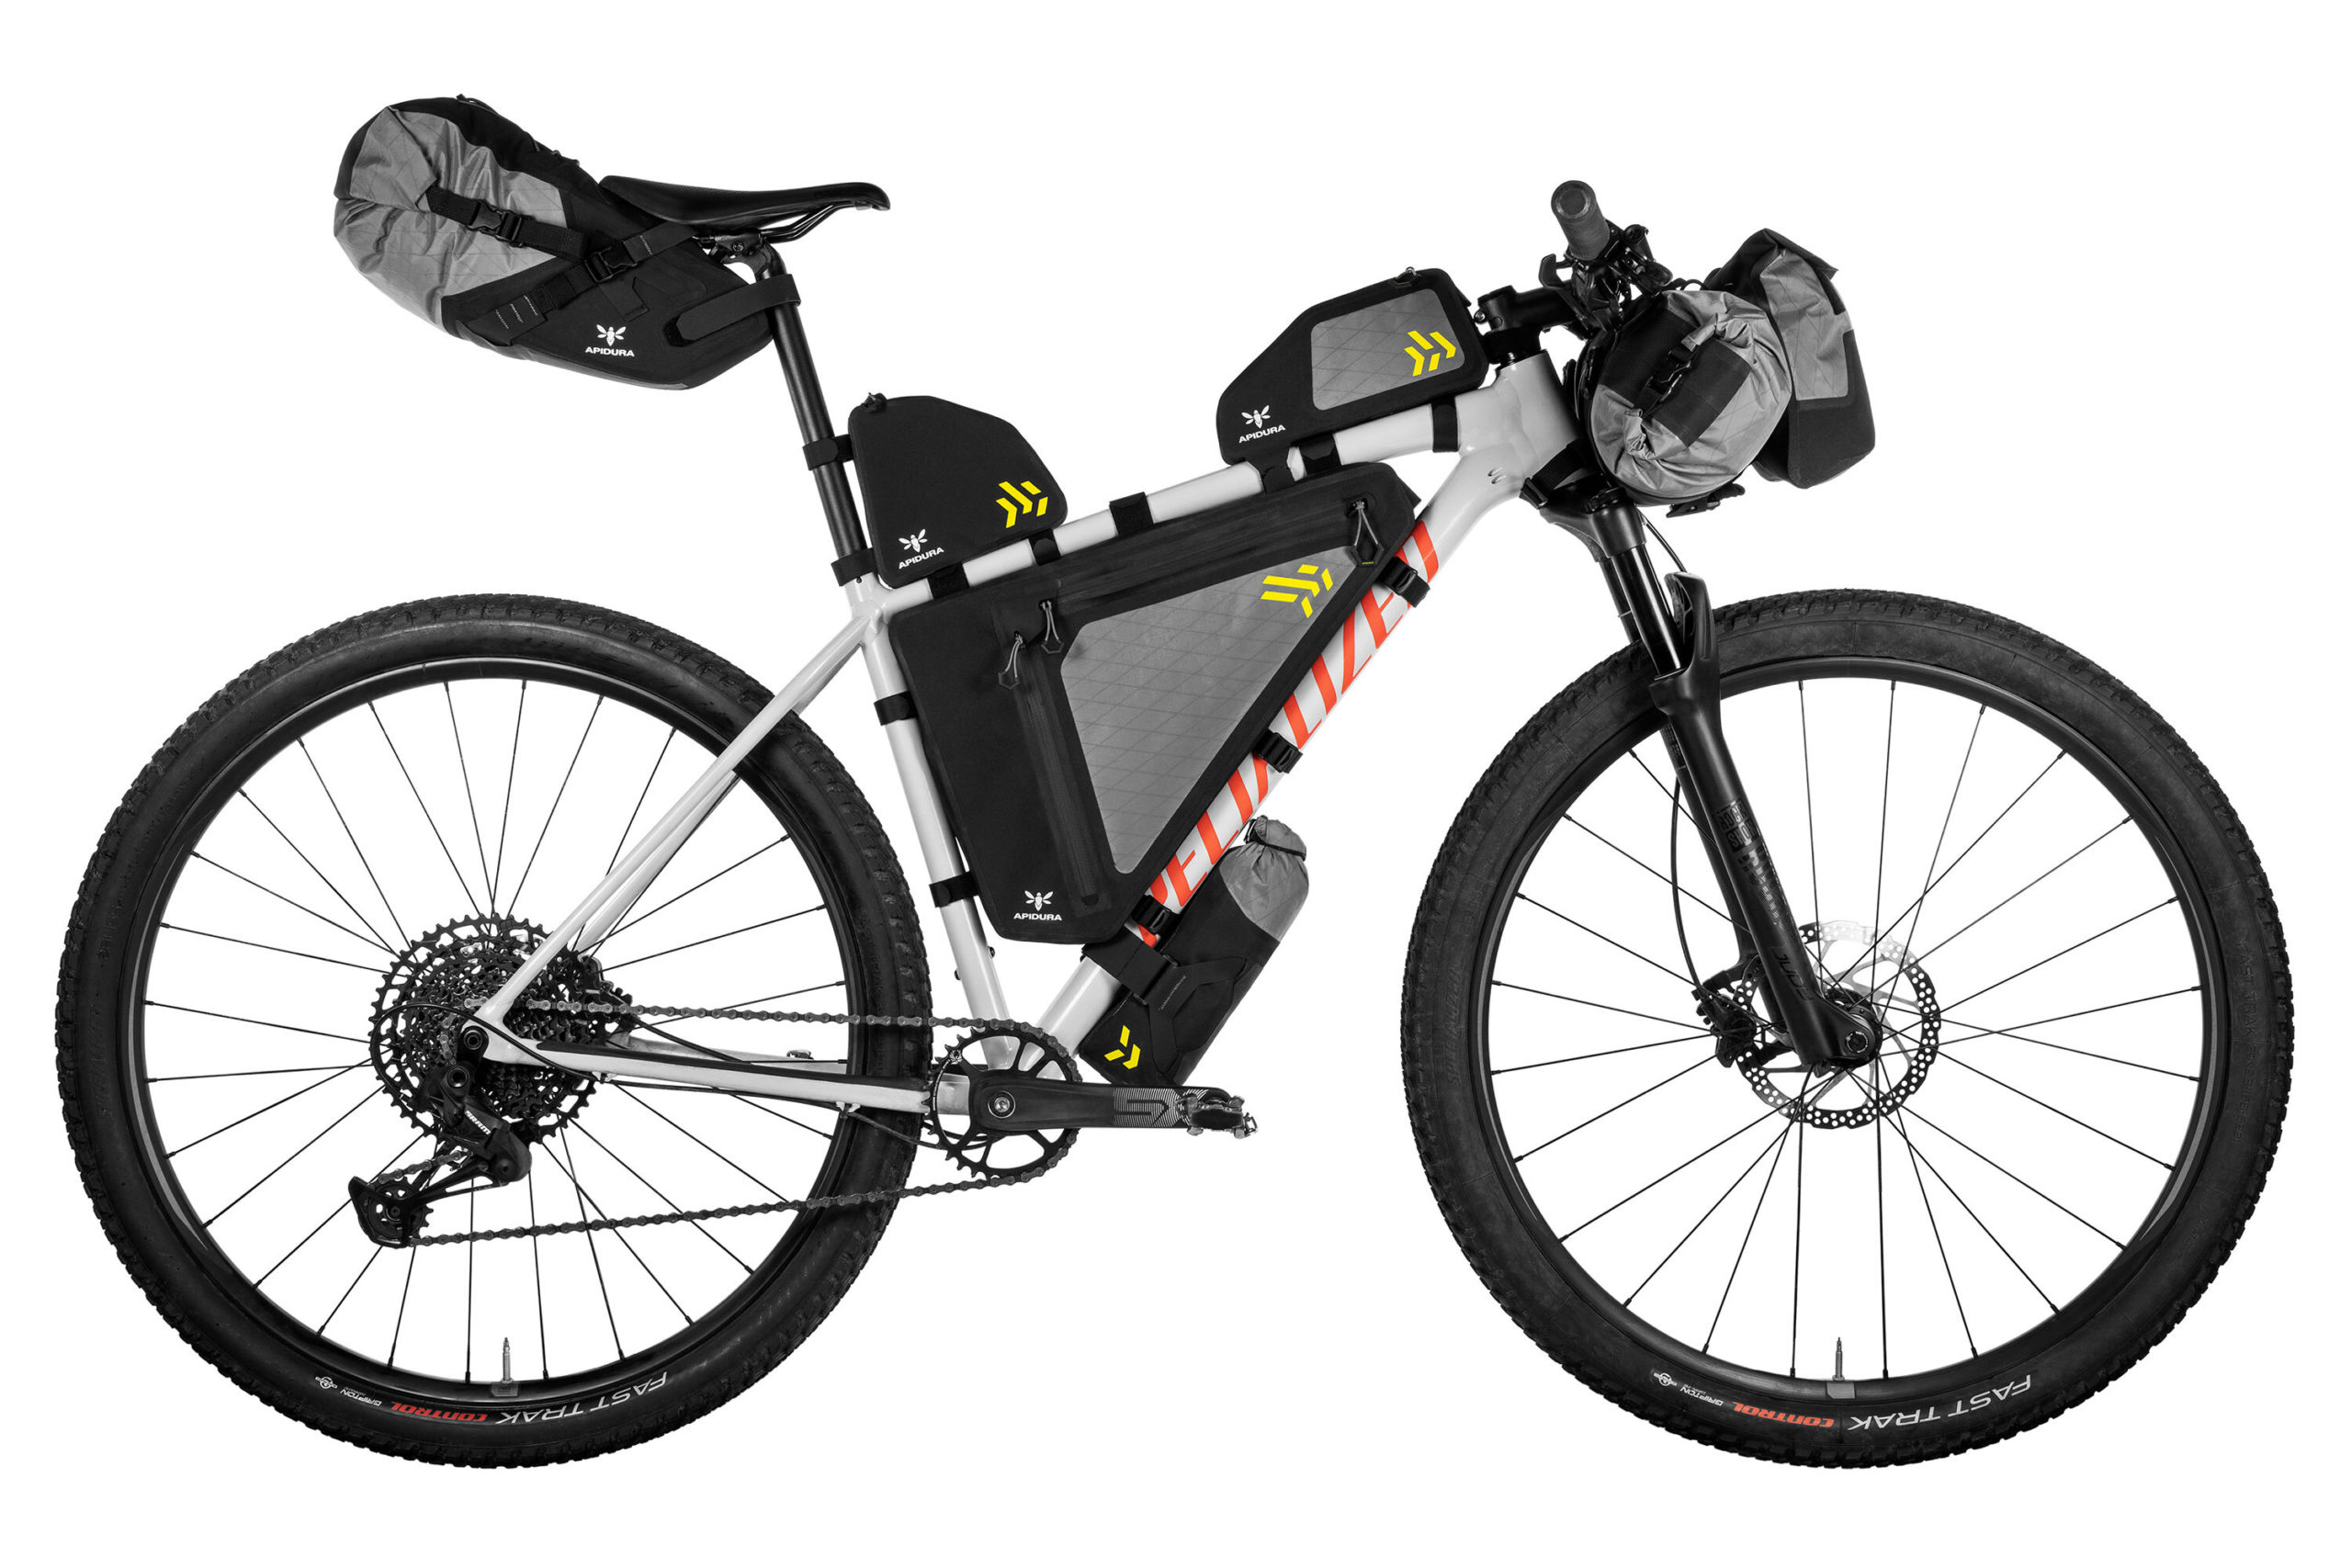 Apidura Backcountry bikepacking bags